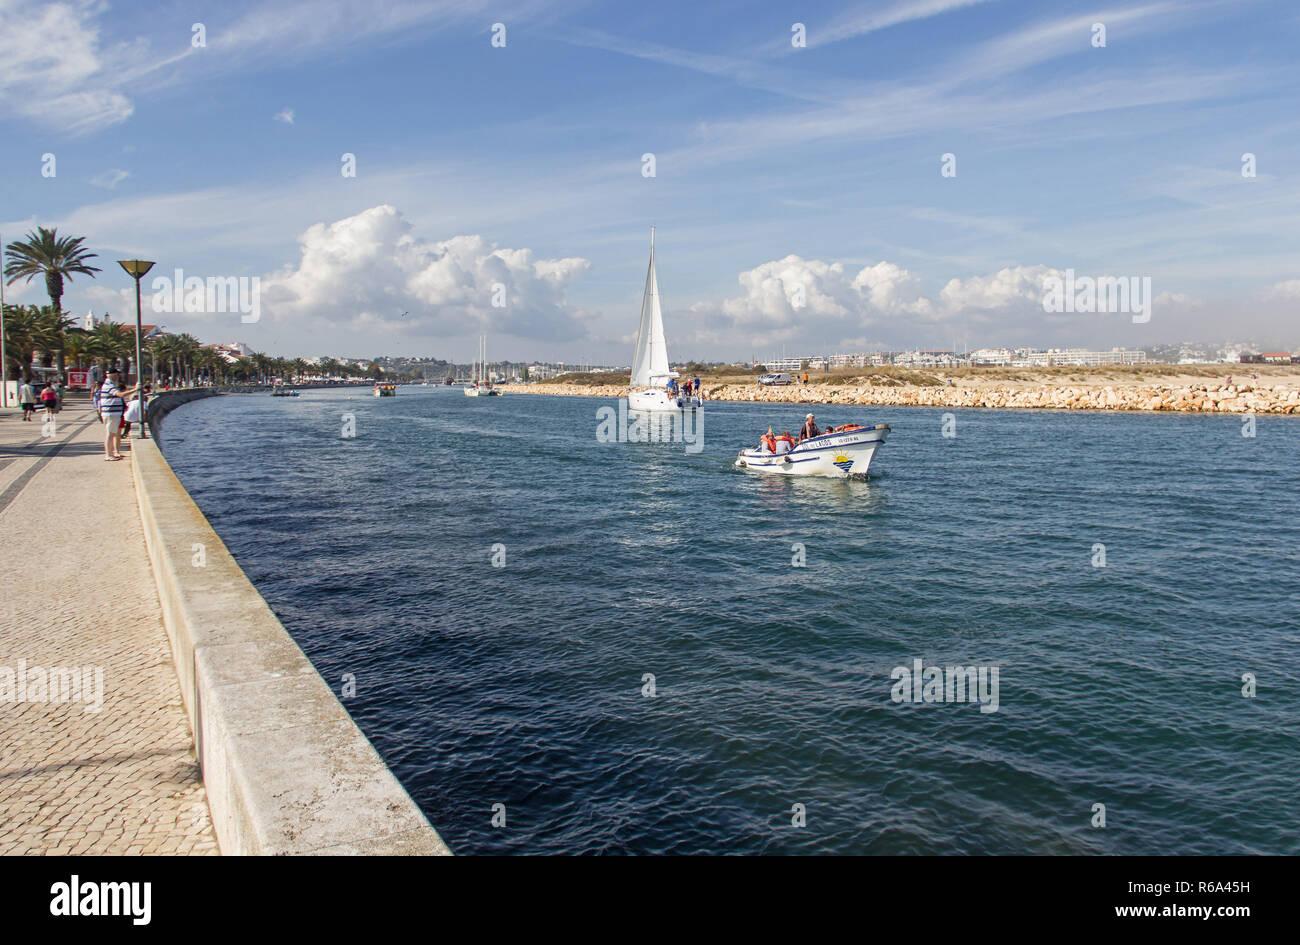 Rio De Bensafrim, Lagos, Algarve, Portugal - Stock Image